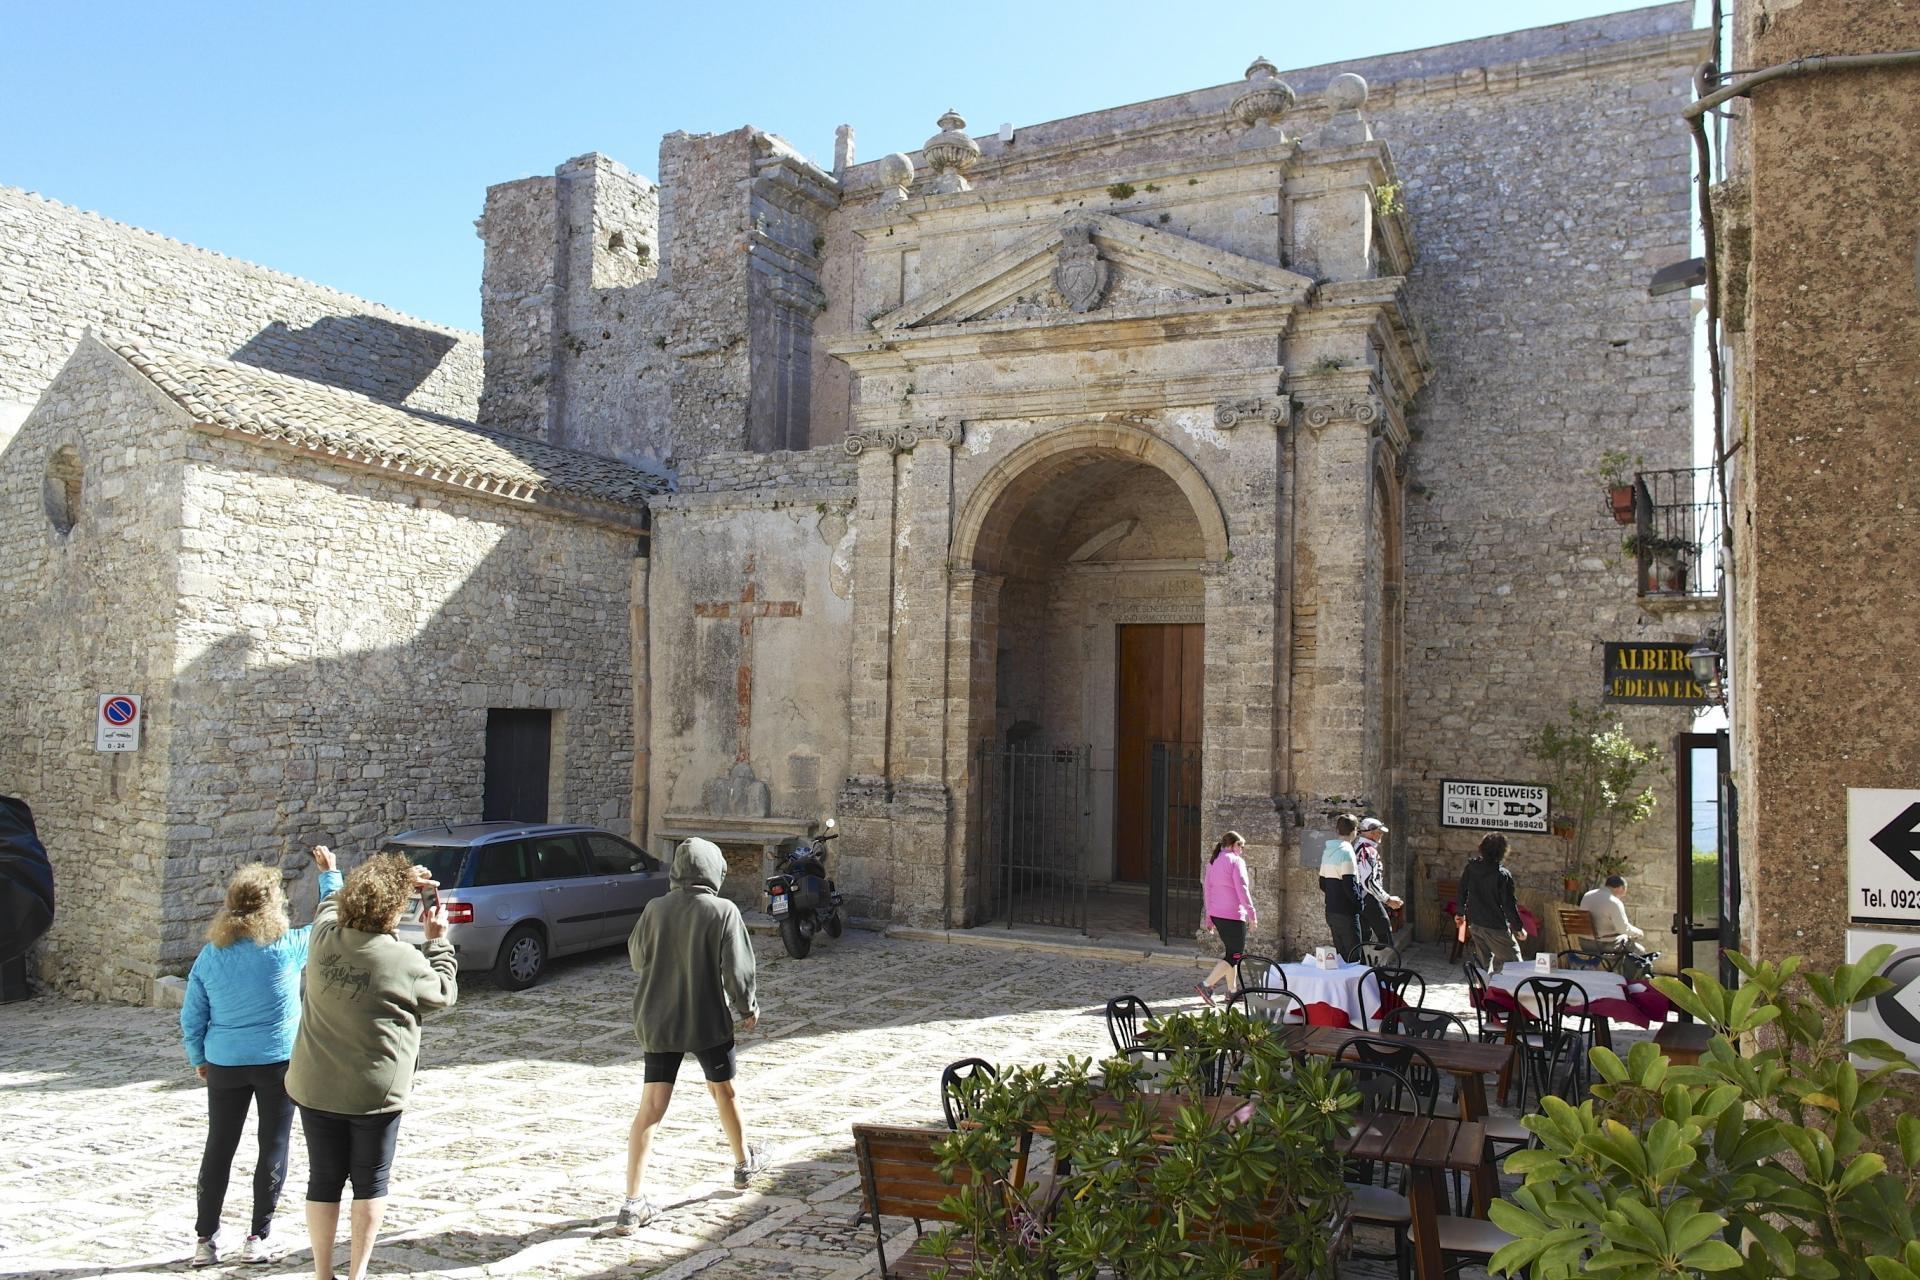 Monreale's world-renowned Cathedral called Santa Maria la Nuova